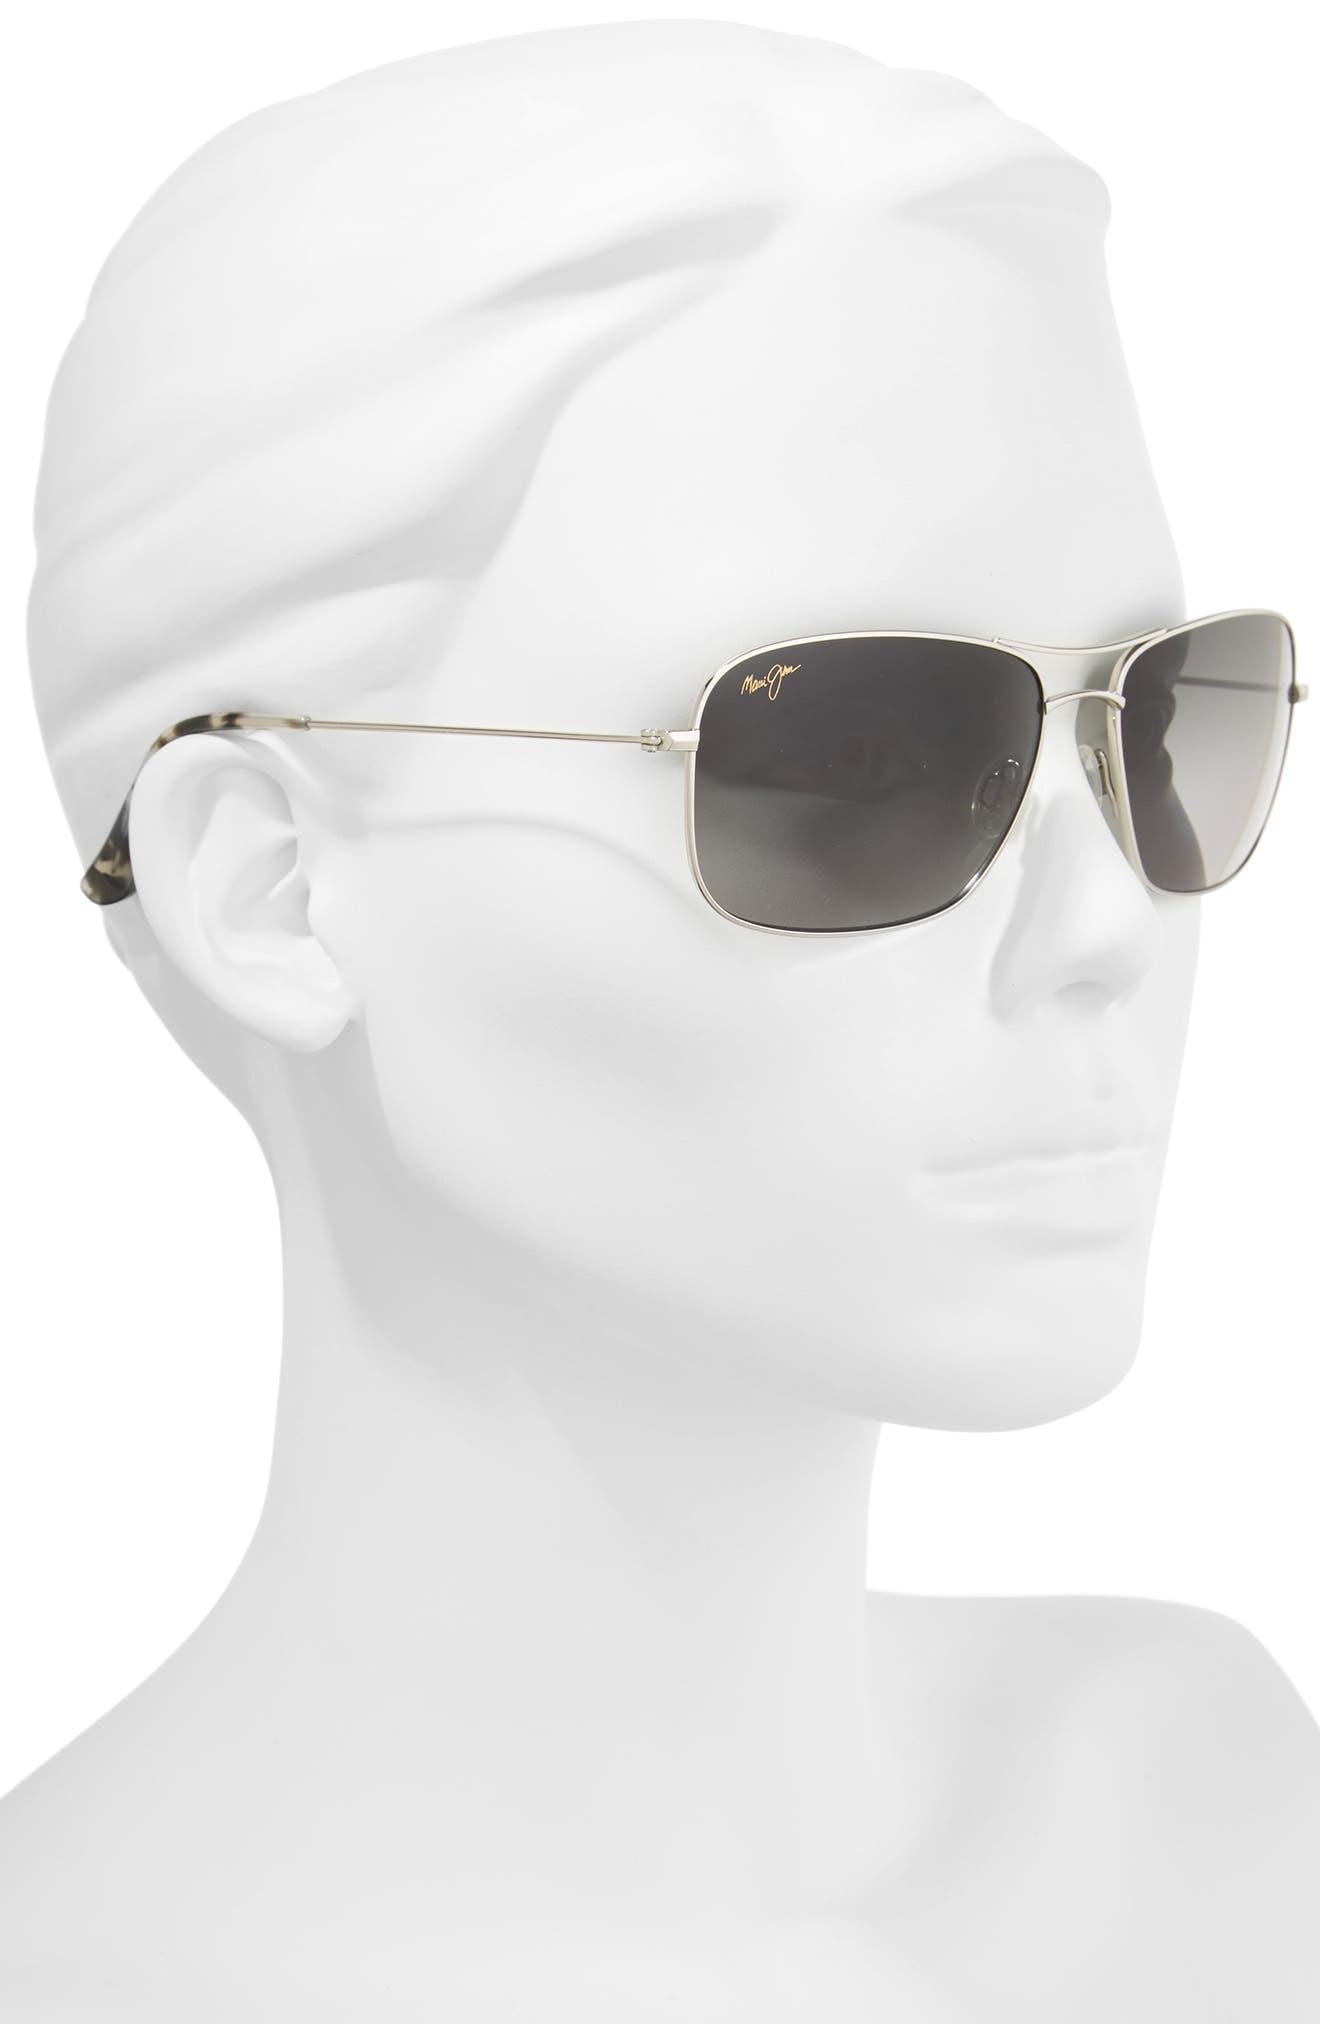 Wiki Wiki 59mm PolarizedPlus2<sup>®</sup> Aviator Sunglasses,                             Alternate thumbnail 3, color,                             SILVER/ NEUTRAL GREY